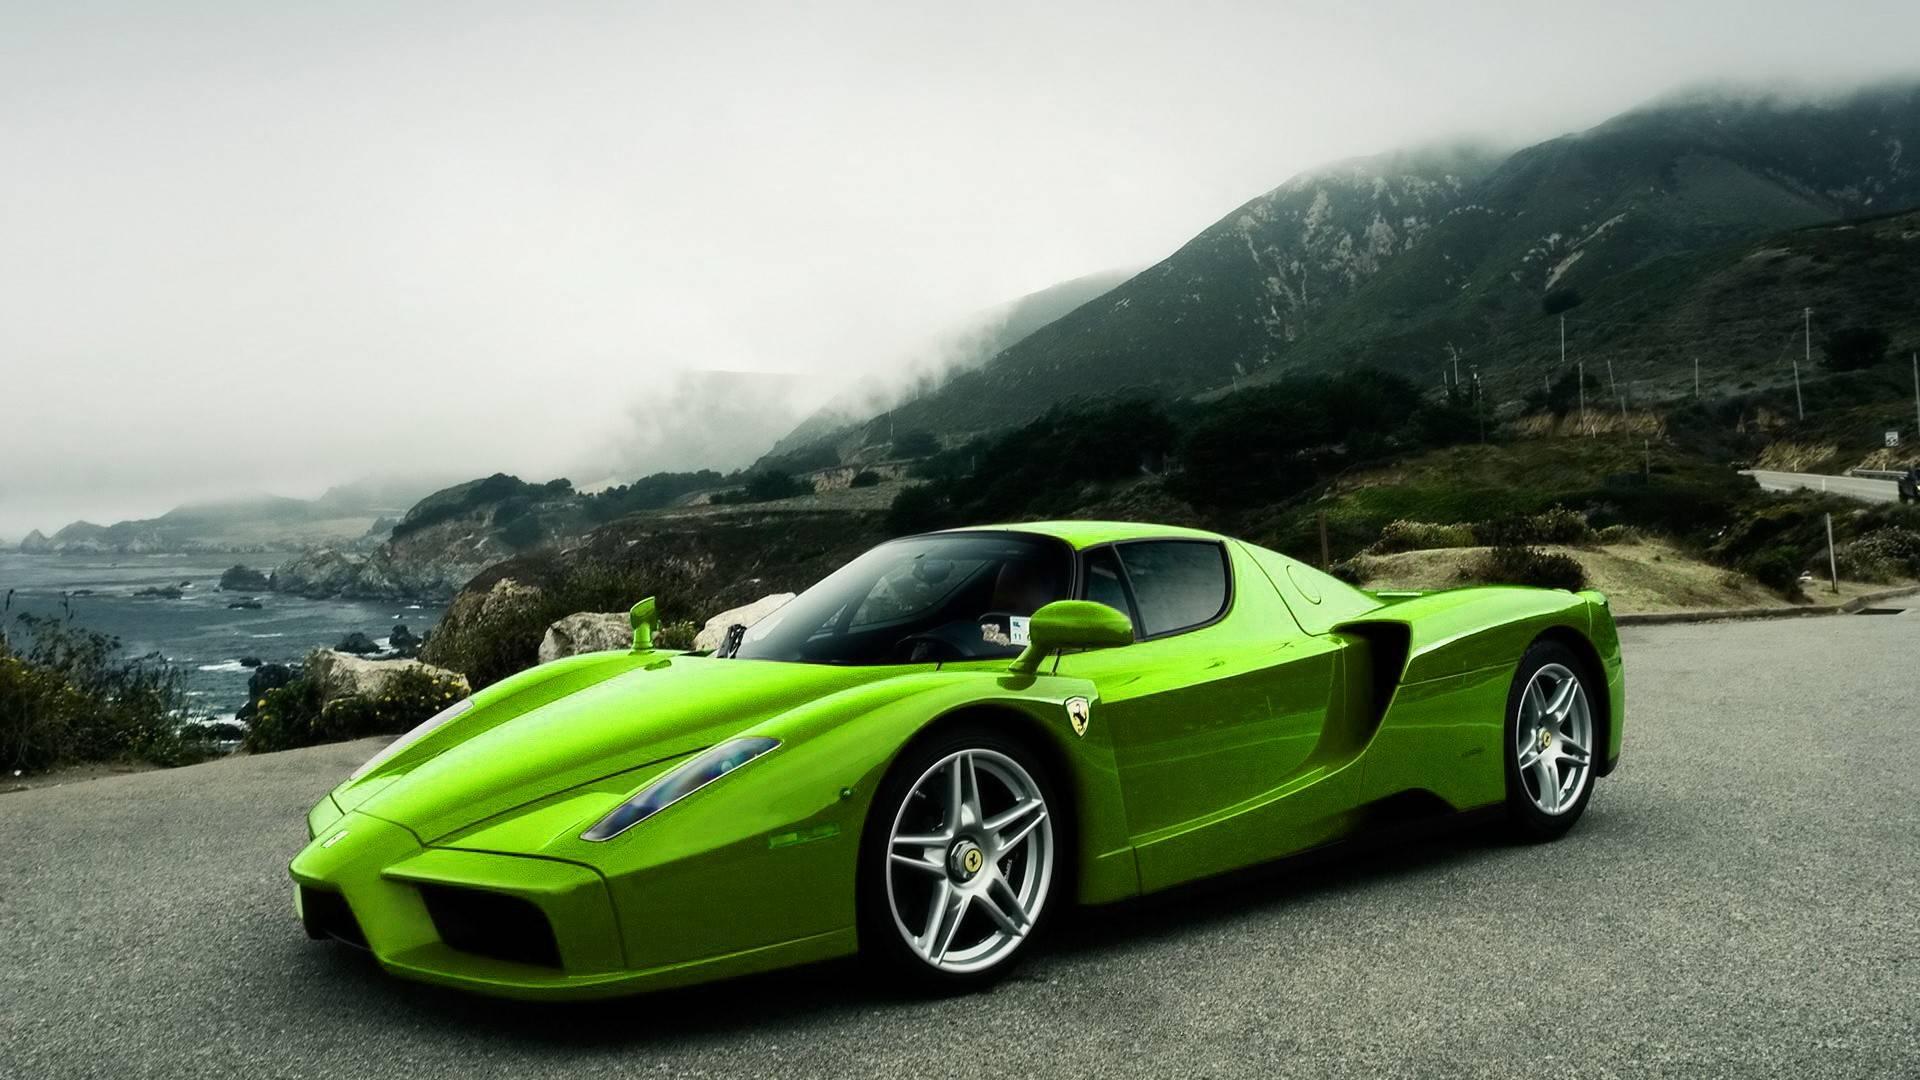 Green And Black Ferrari Wallpaper 6 Background